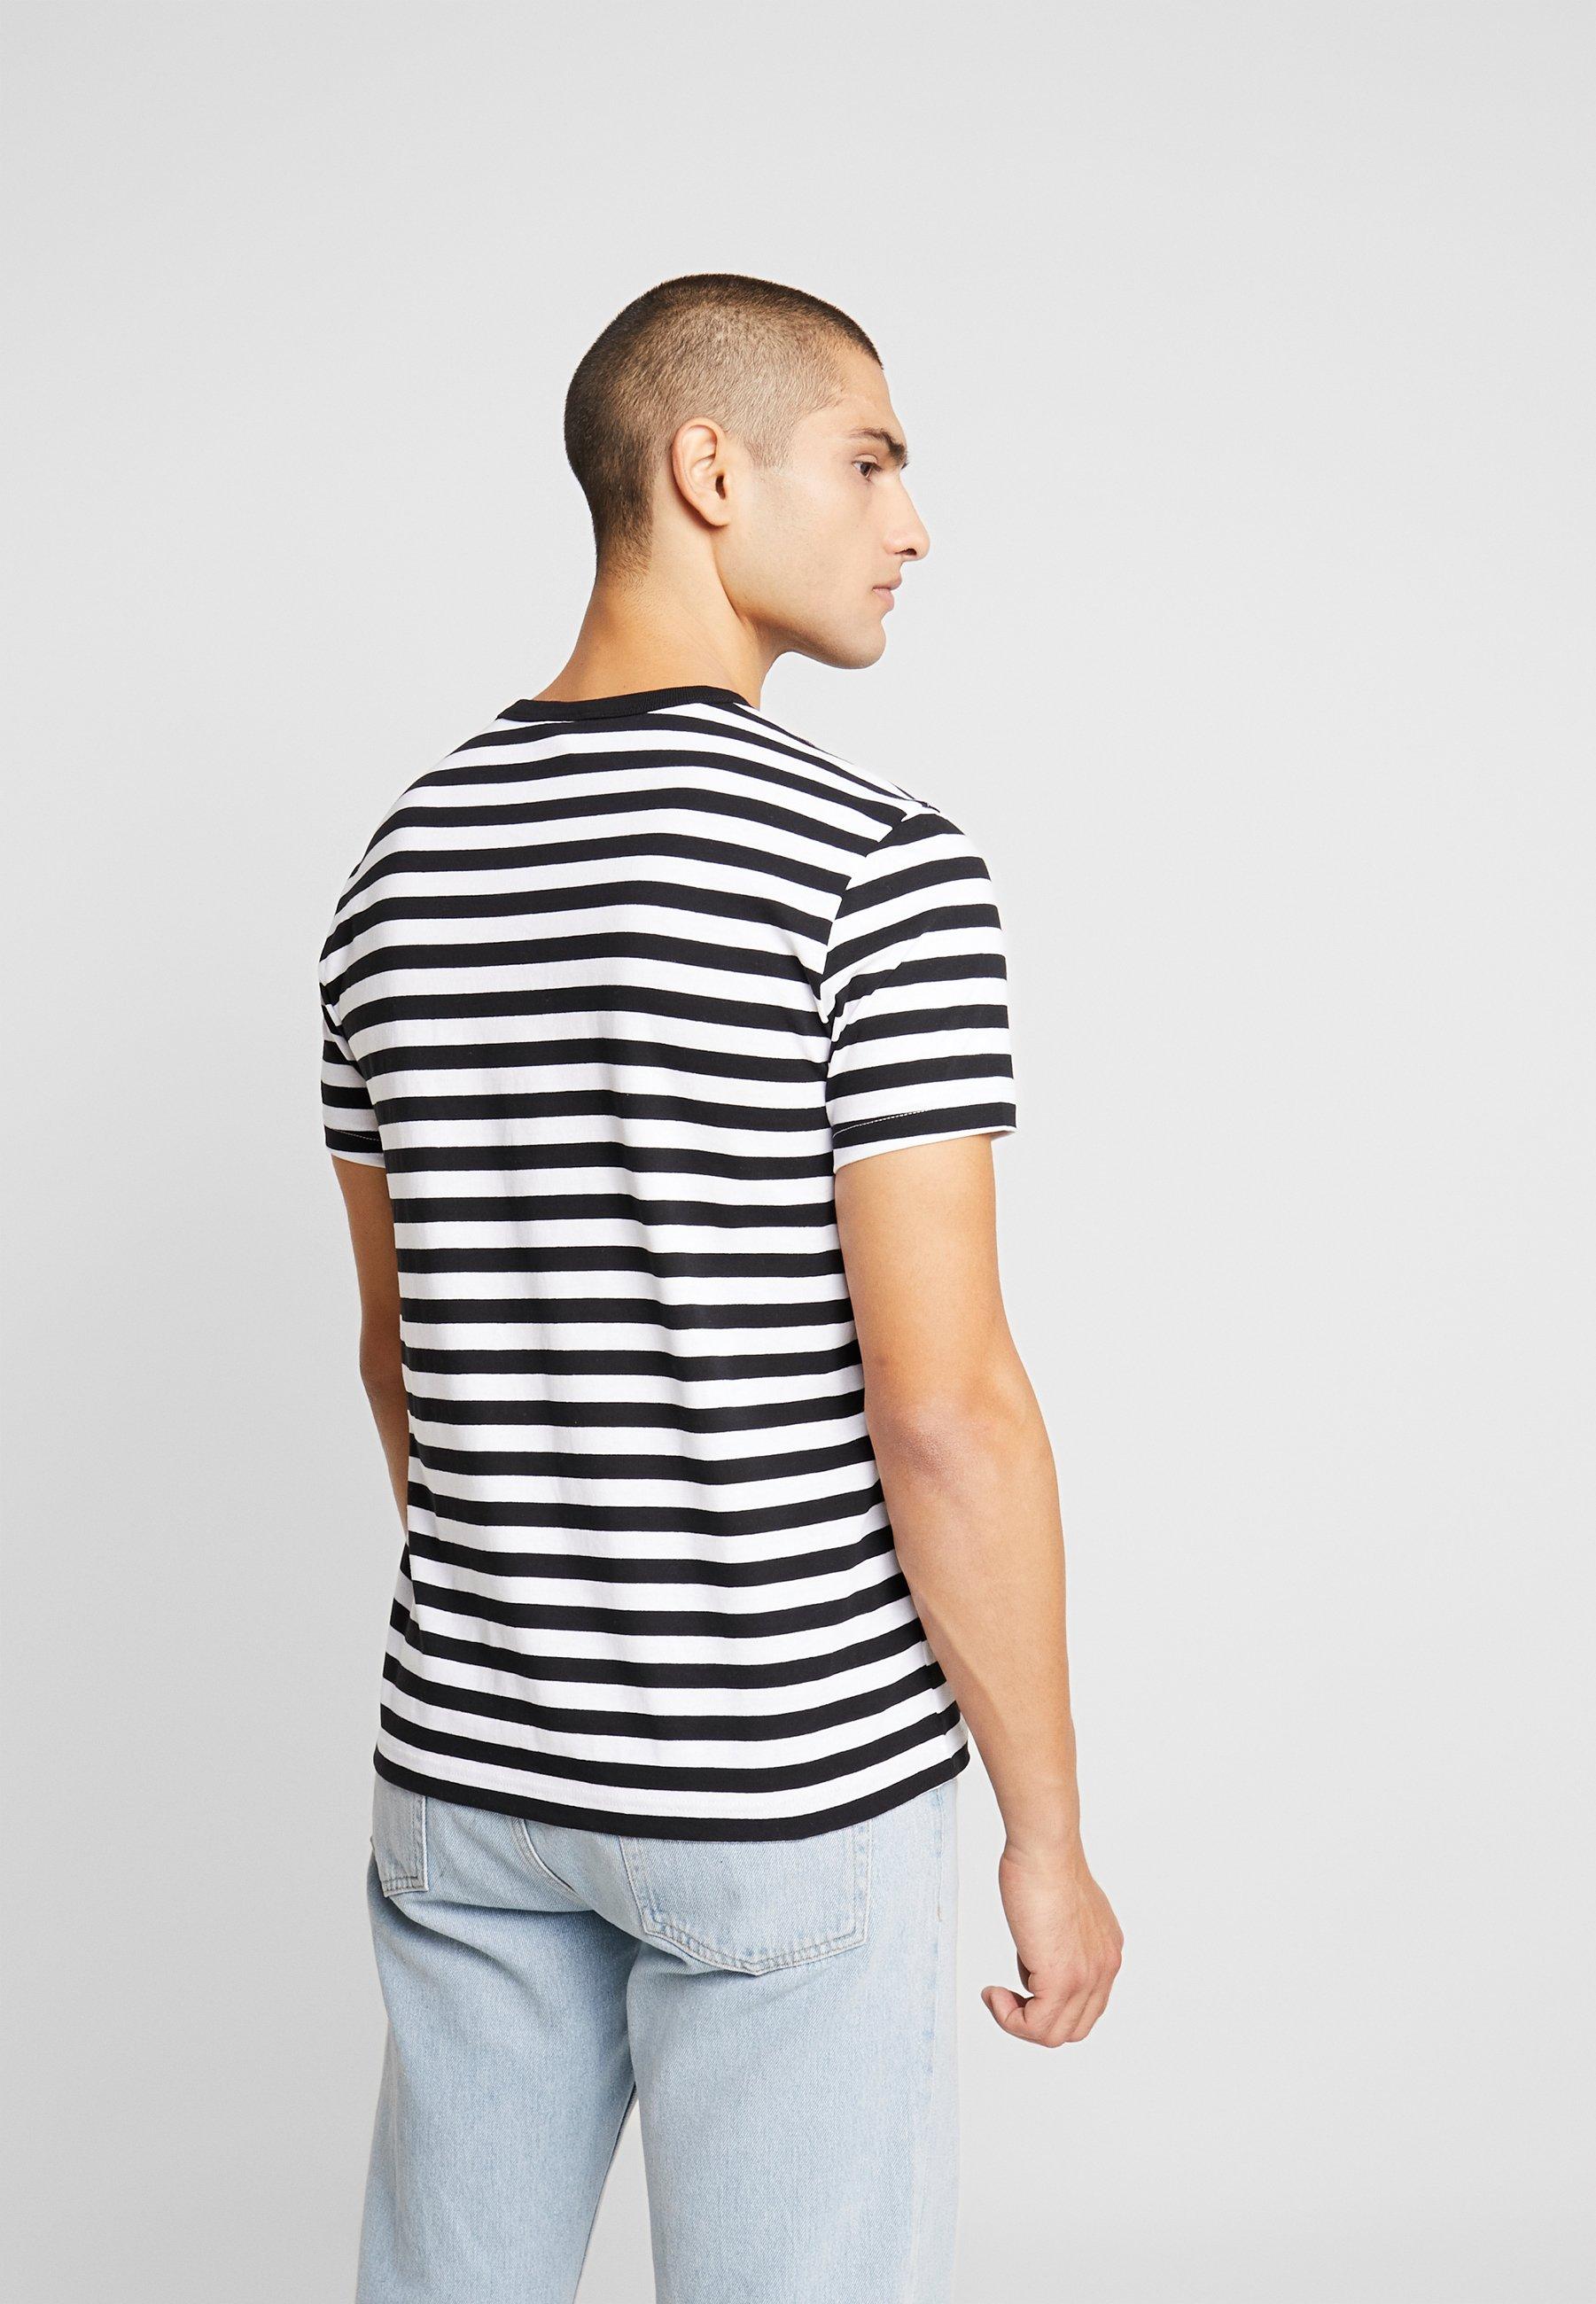 white Stampa Black Weave Logo shirt Reverse Champion StripedT Small Con nwPNO8Xk0Z